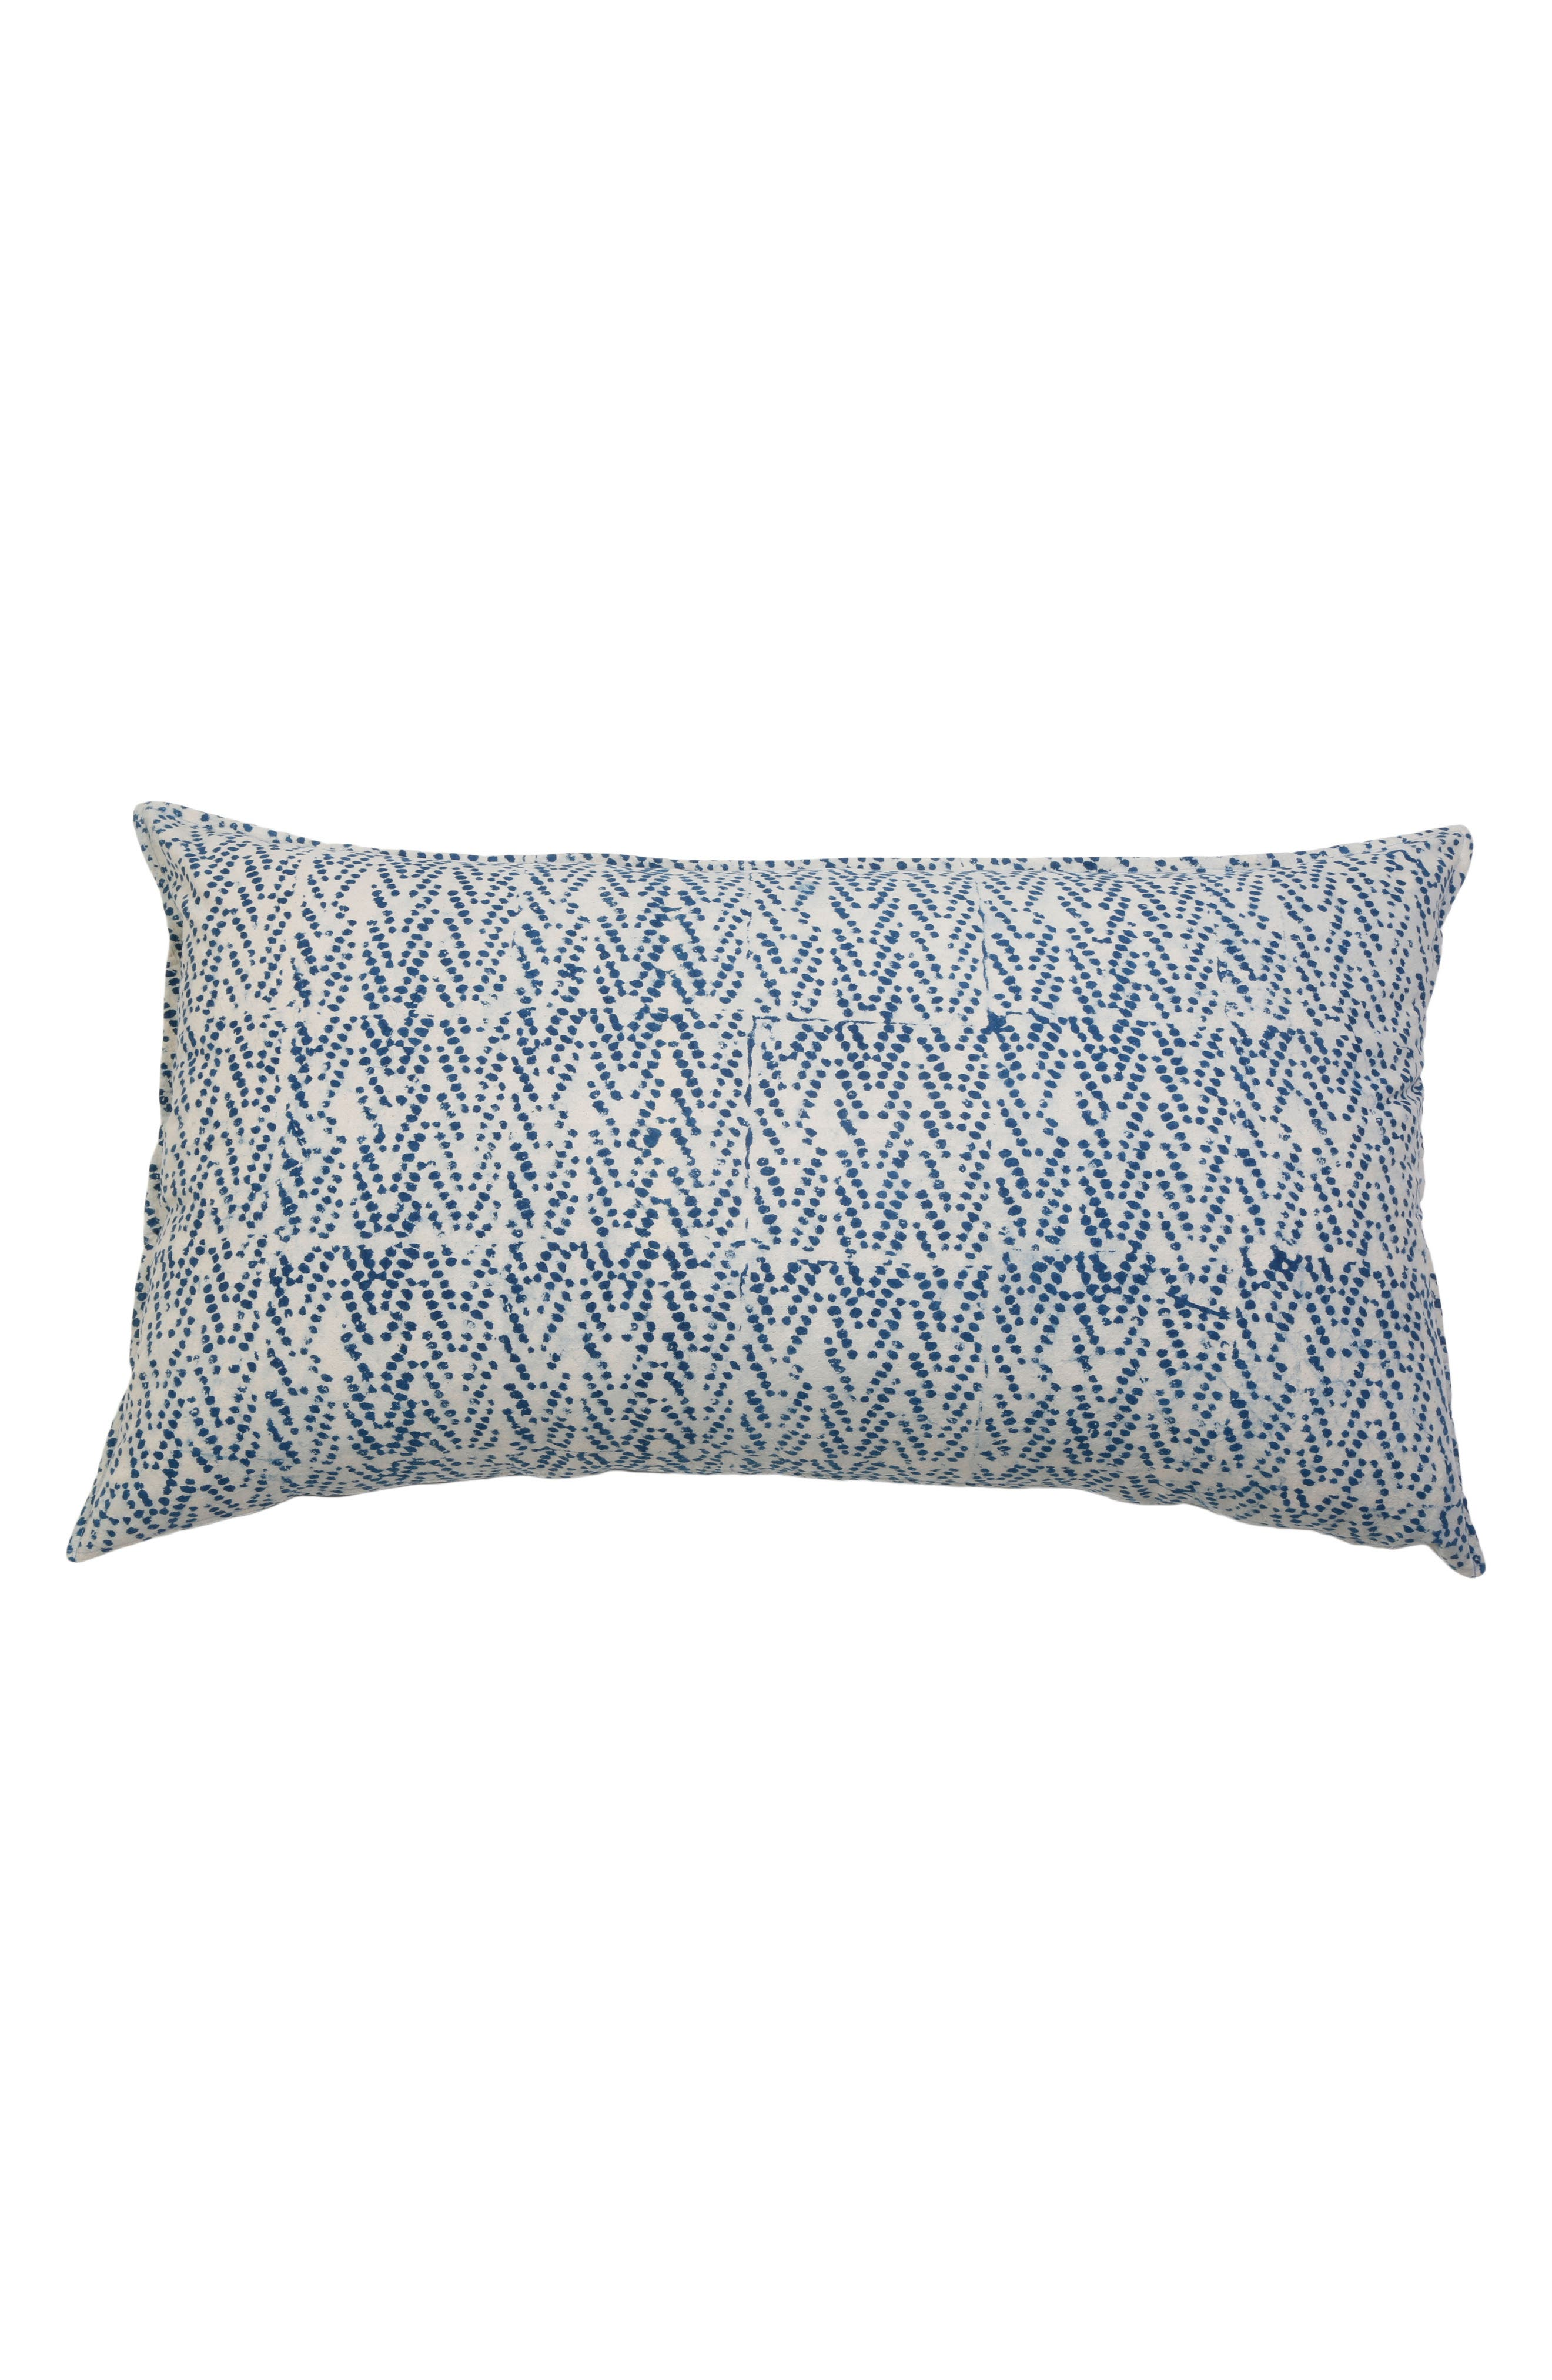 Indigo Dots Accent Pillow,                         Main,                         color,